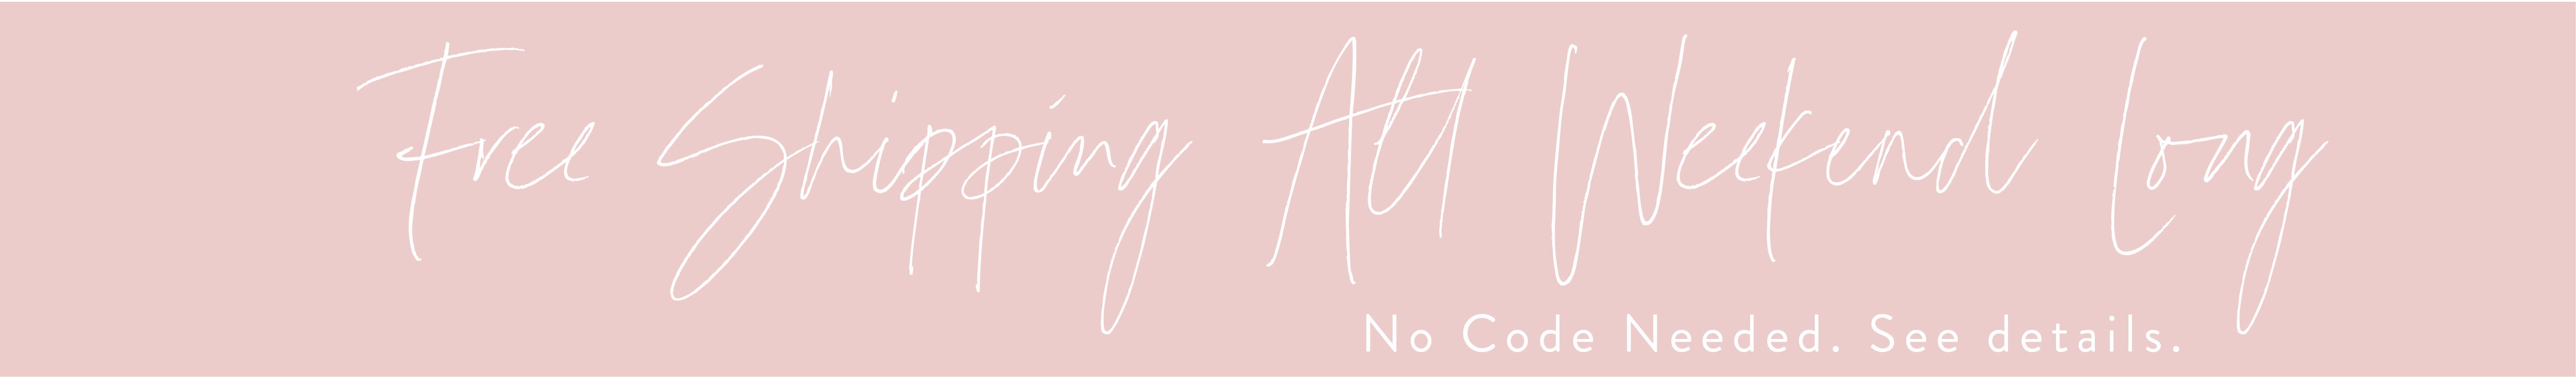 free-shipping-promo-banner-01-02.jpg